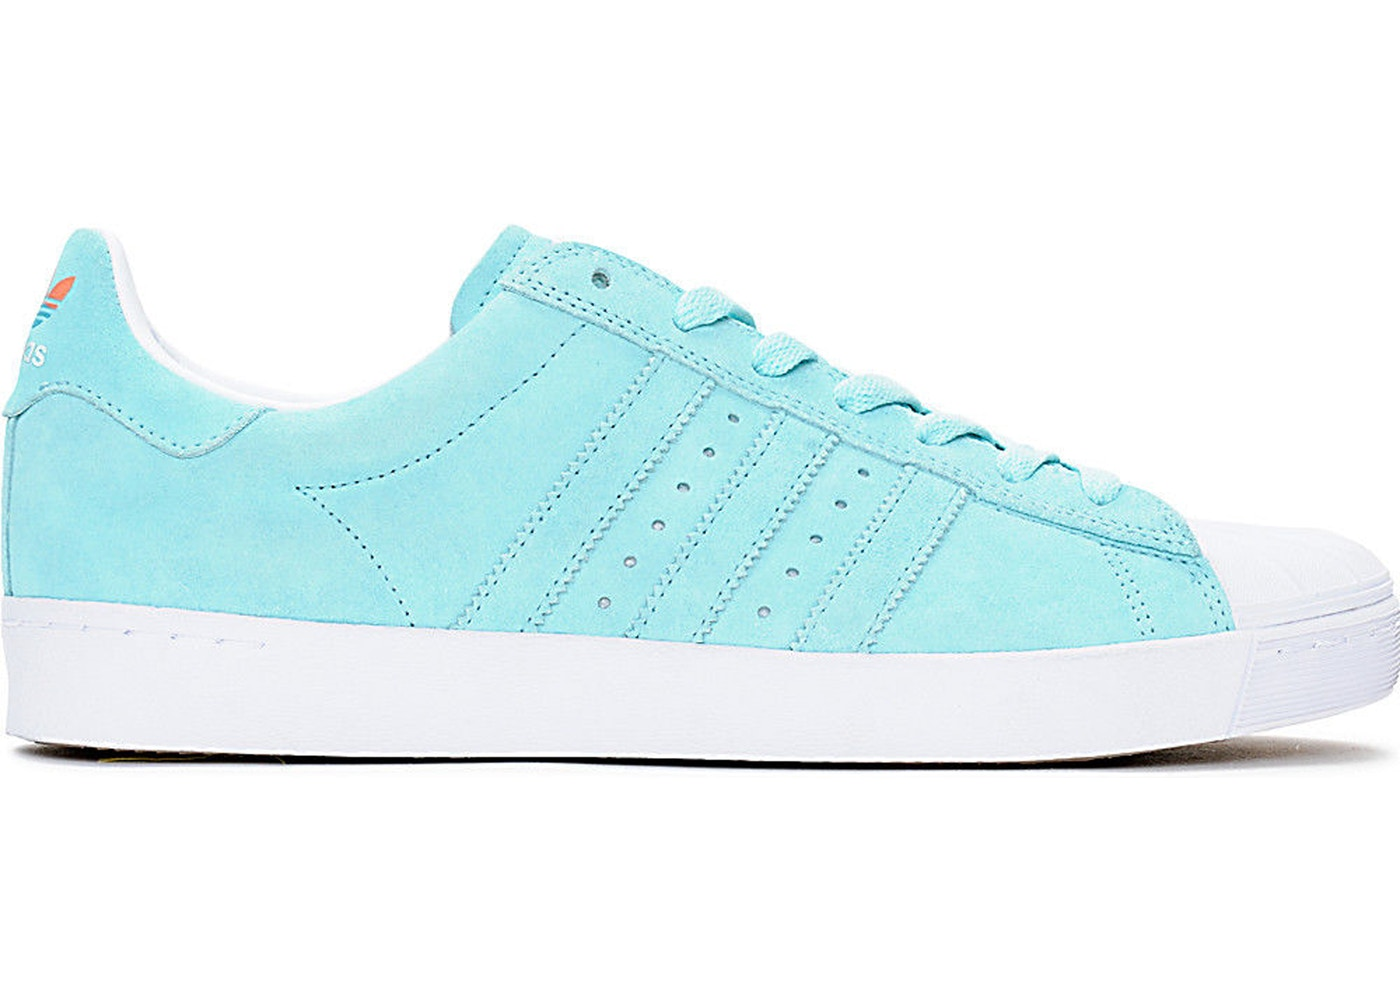 adidas Superstar Vulc Adv Blue Pastel - CG4840